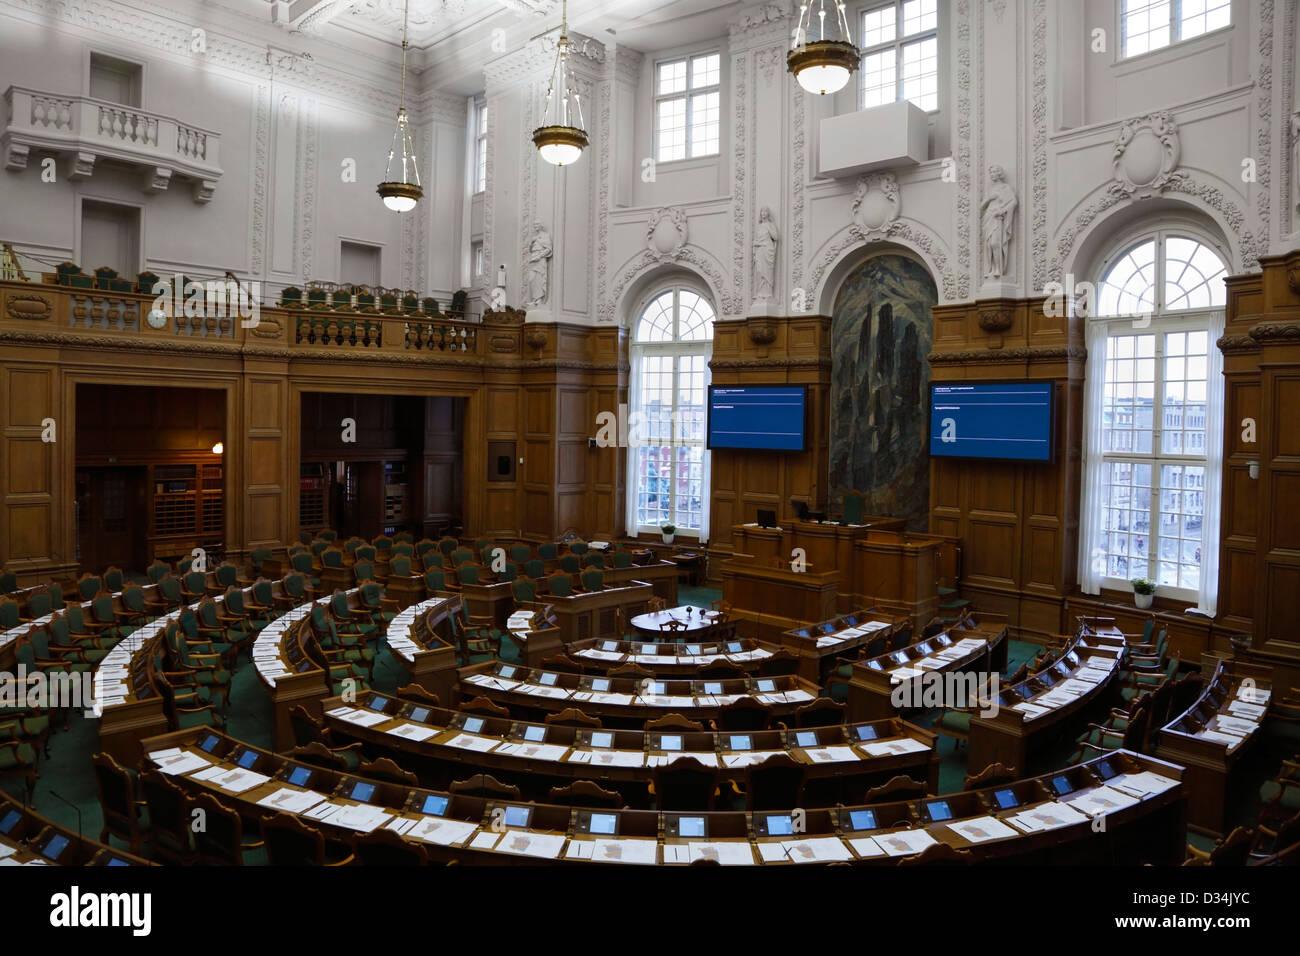 The Folketing, the Danish Parliament, at Christiansborg Castle, Copenhagen, Denmark. The hall is empty. - Stock Image